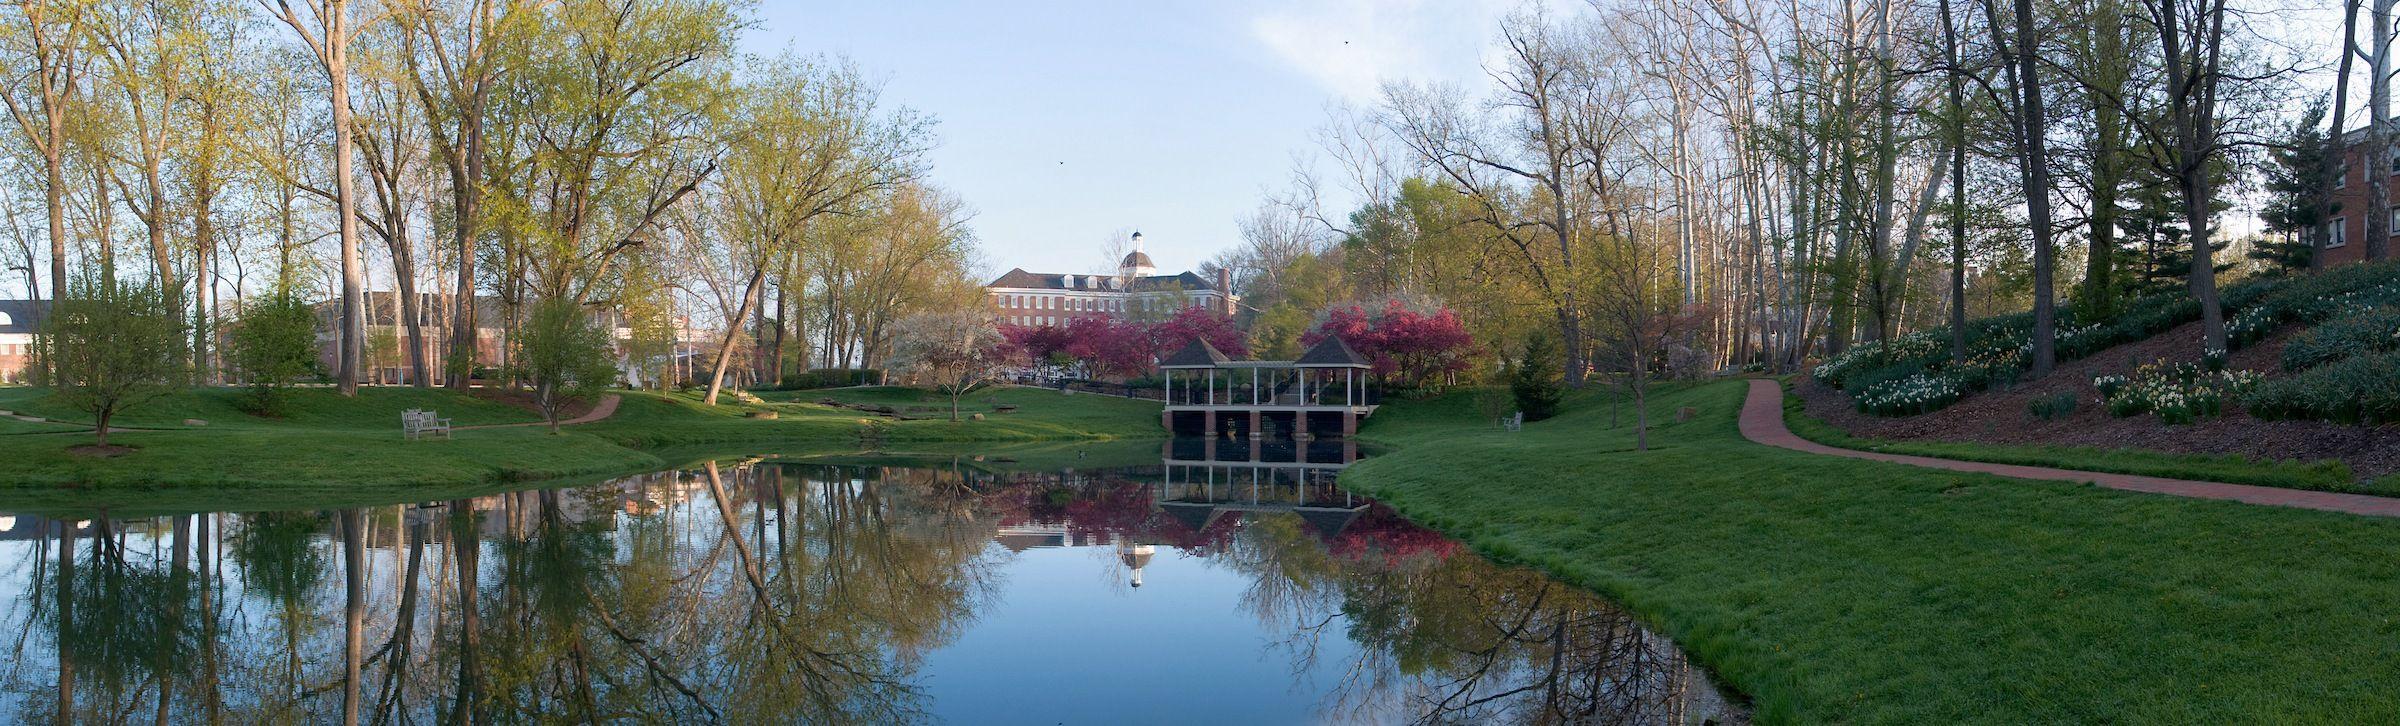 Ohio University Academic Calendar 2020-21 University Registrar | Ohio University